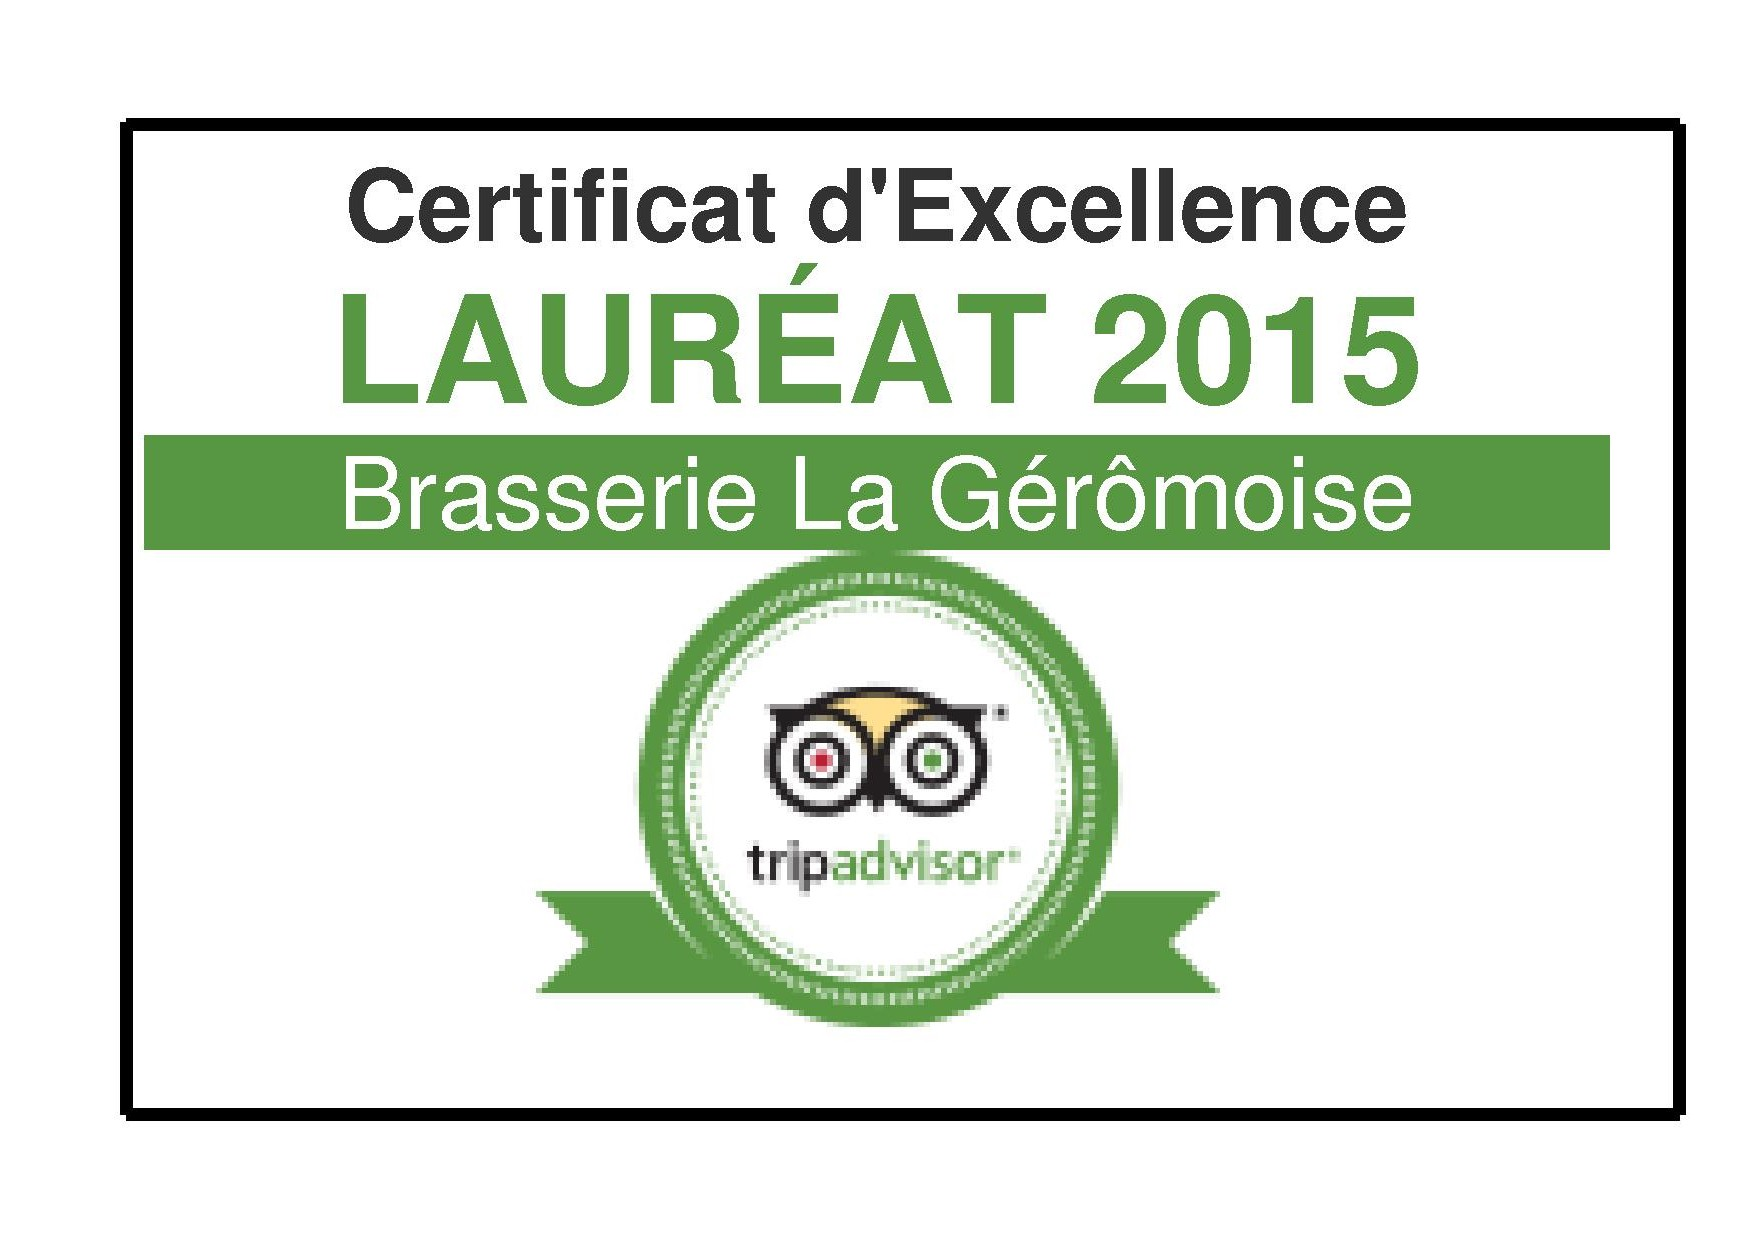 certificat-excellence-2015.jpg